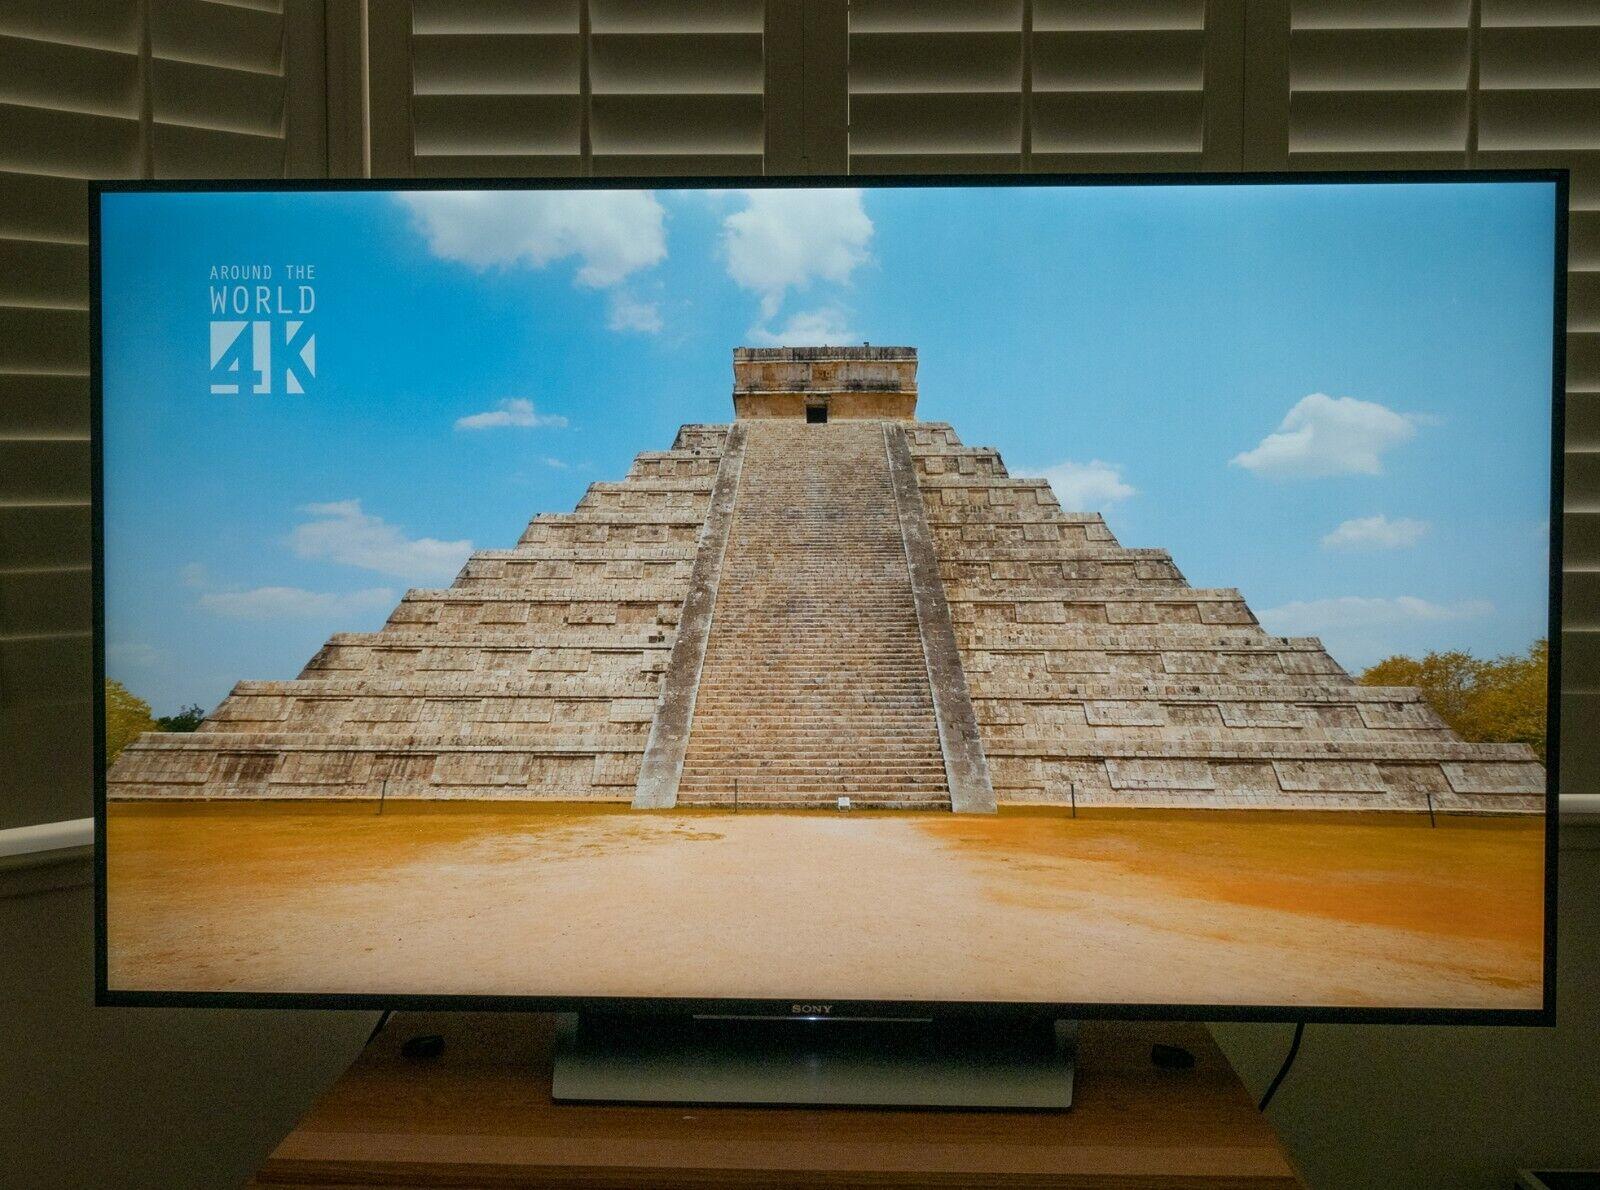 Sony XBR-65X850D 65-Inch 4K HDR Ultra HD Smart LED TV